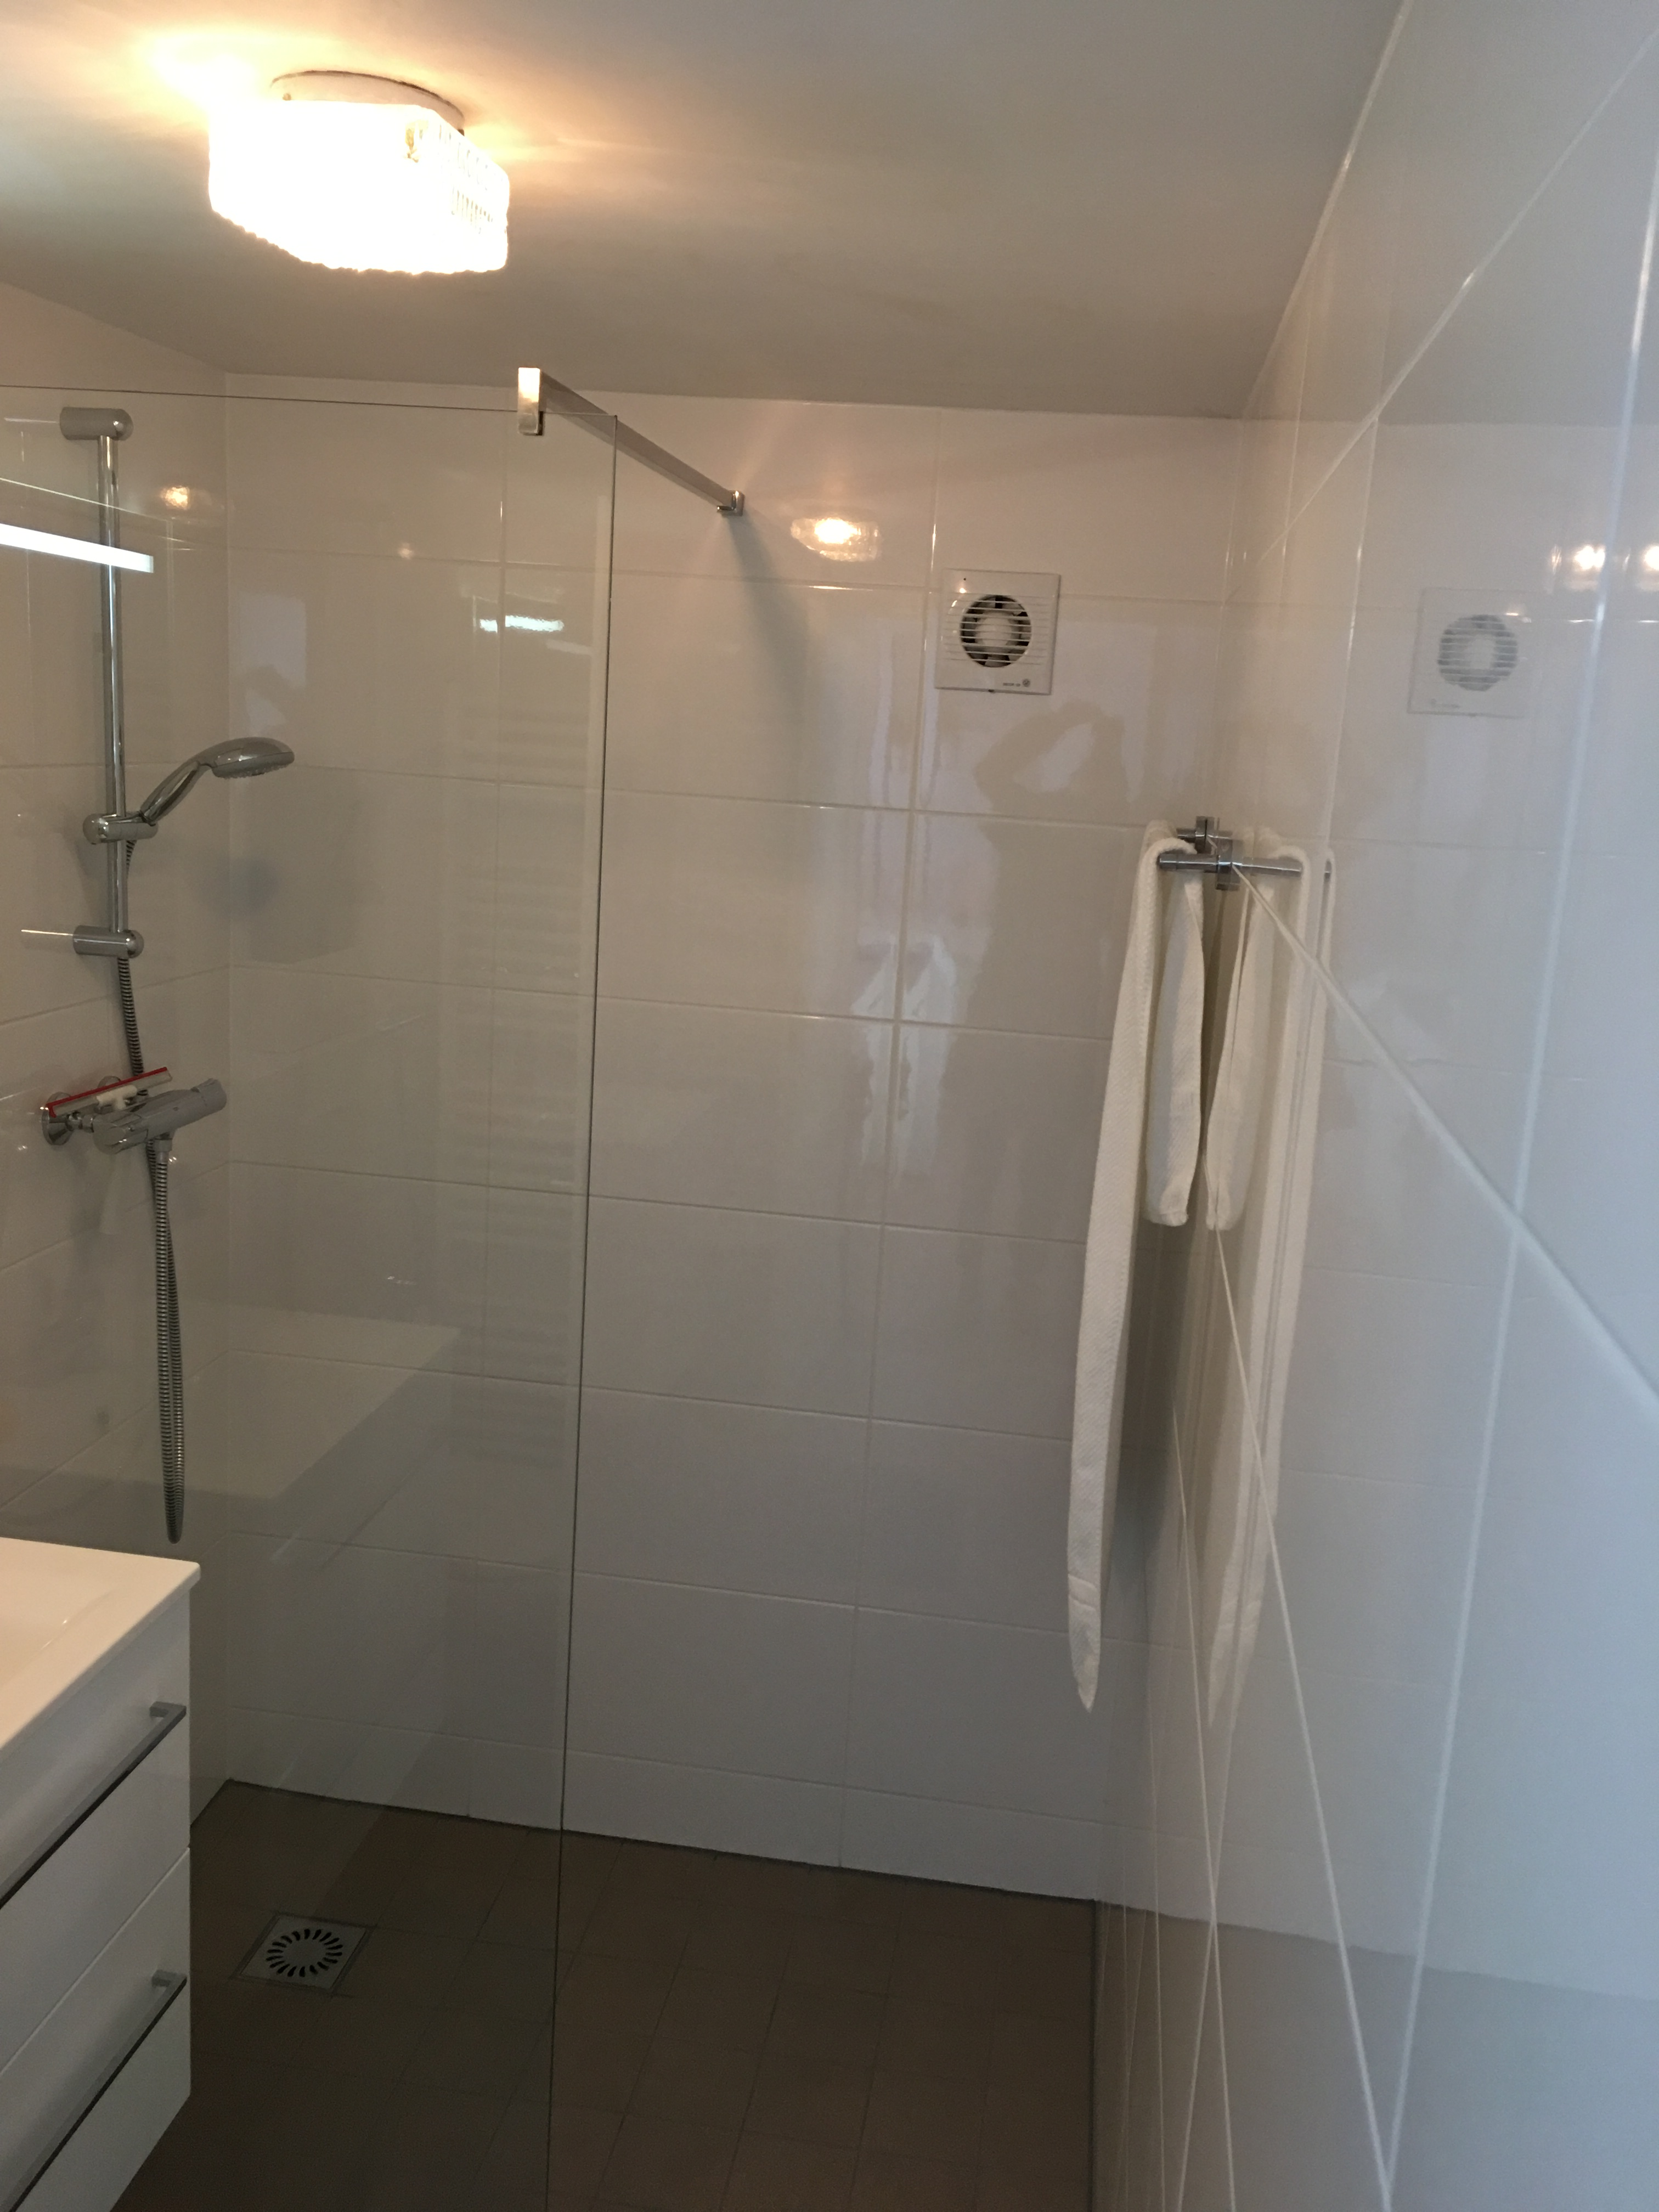 Mooie kleine badkamer gerealiseerd in appartement homma loodgieters - Kleine badkamer m ...